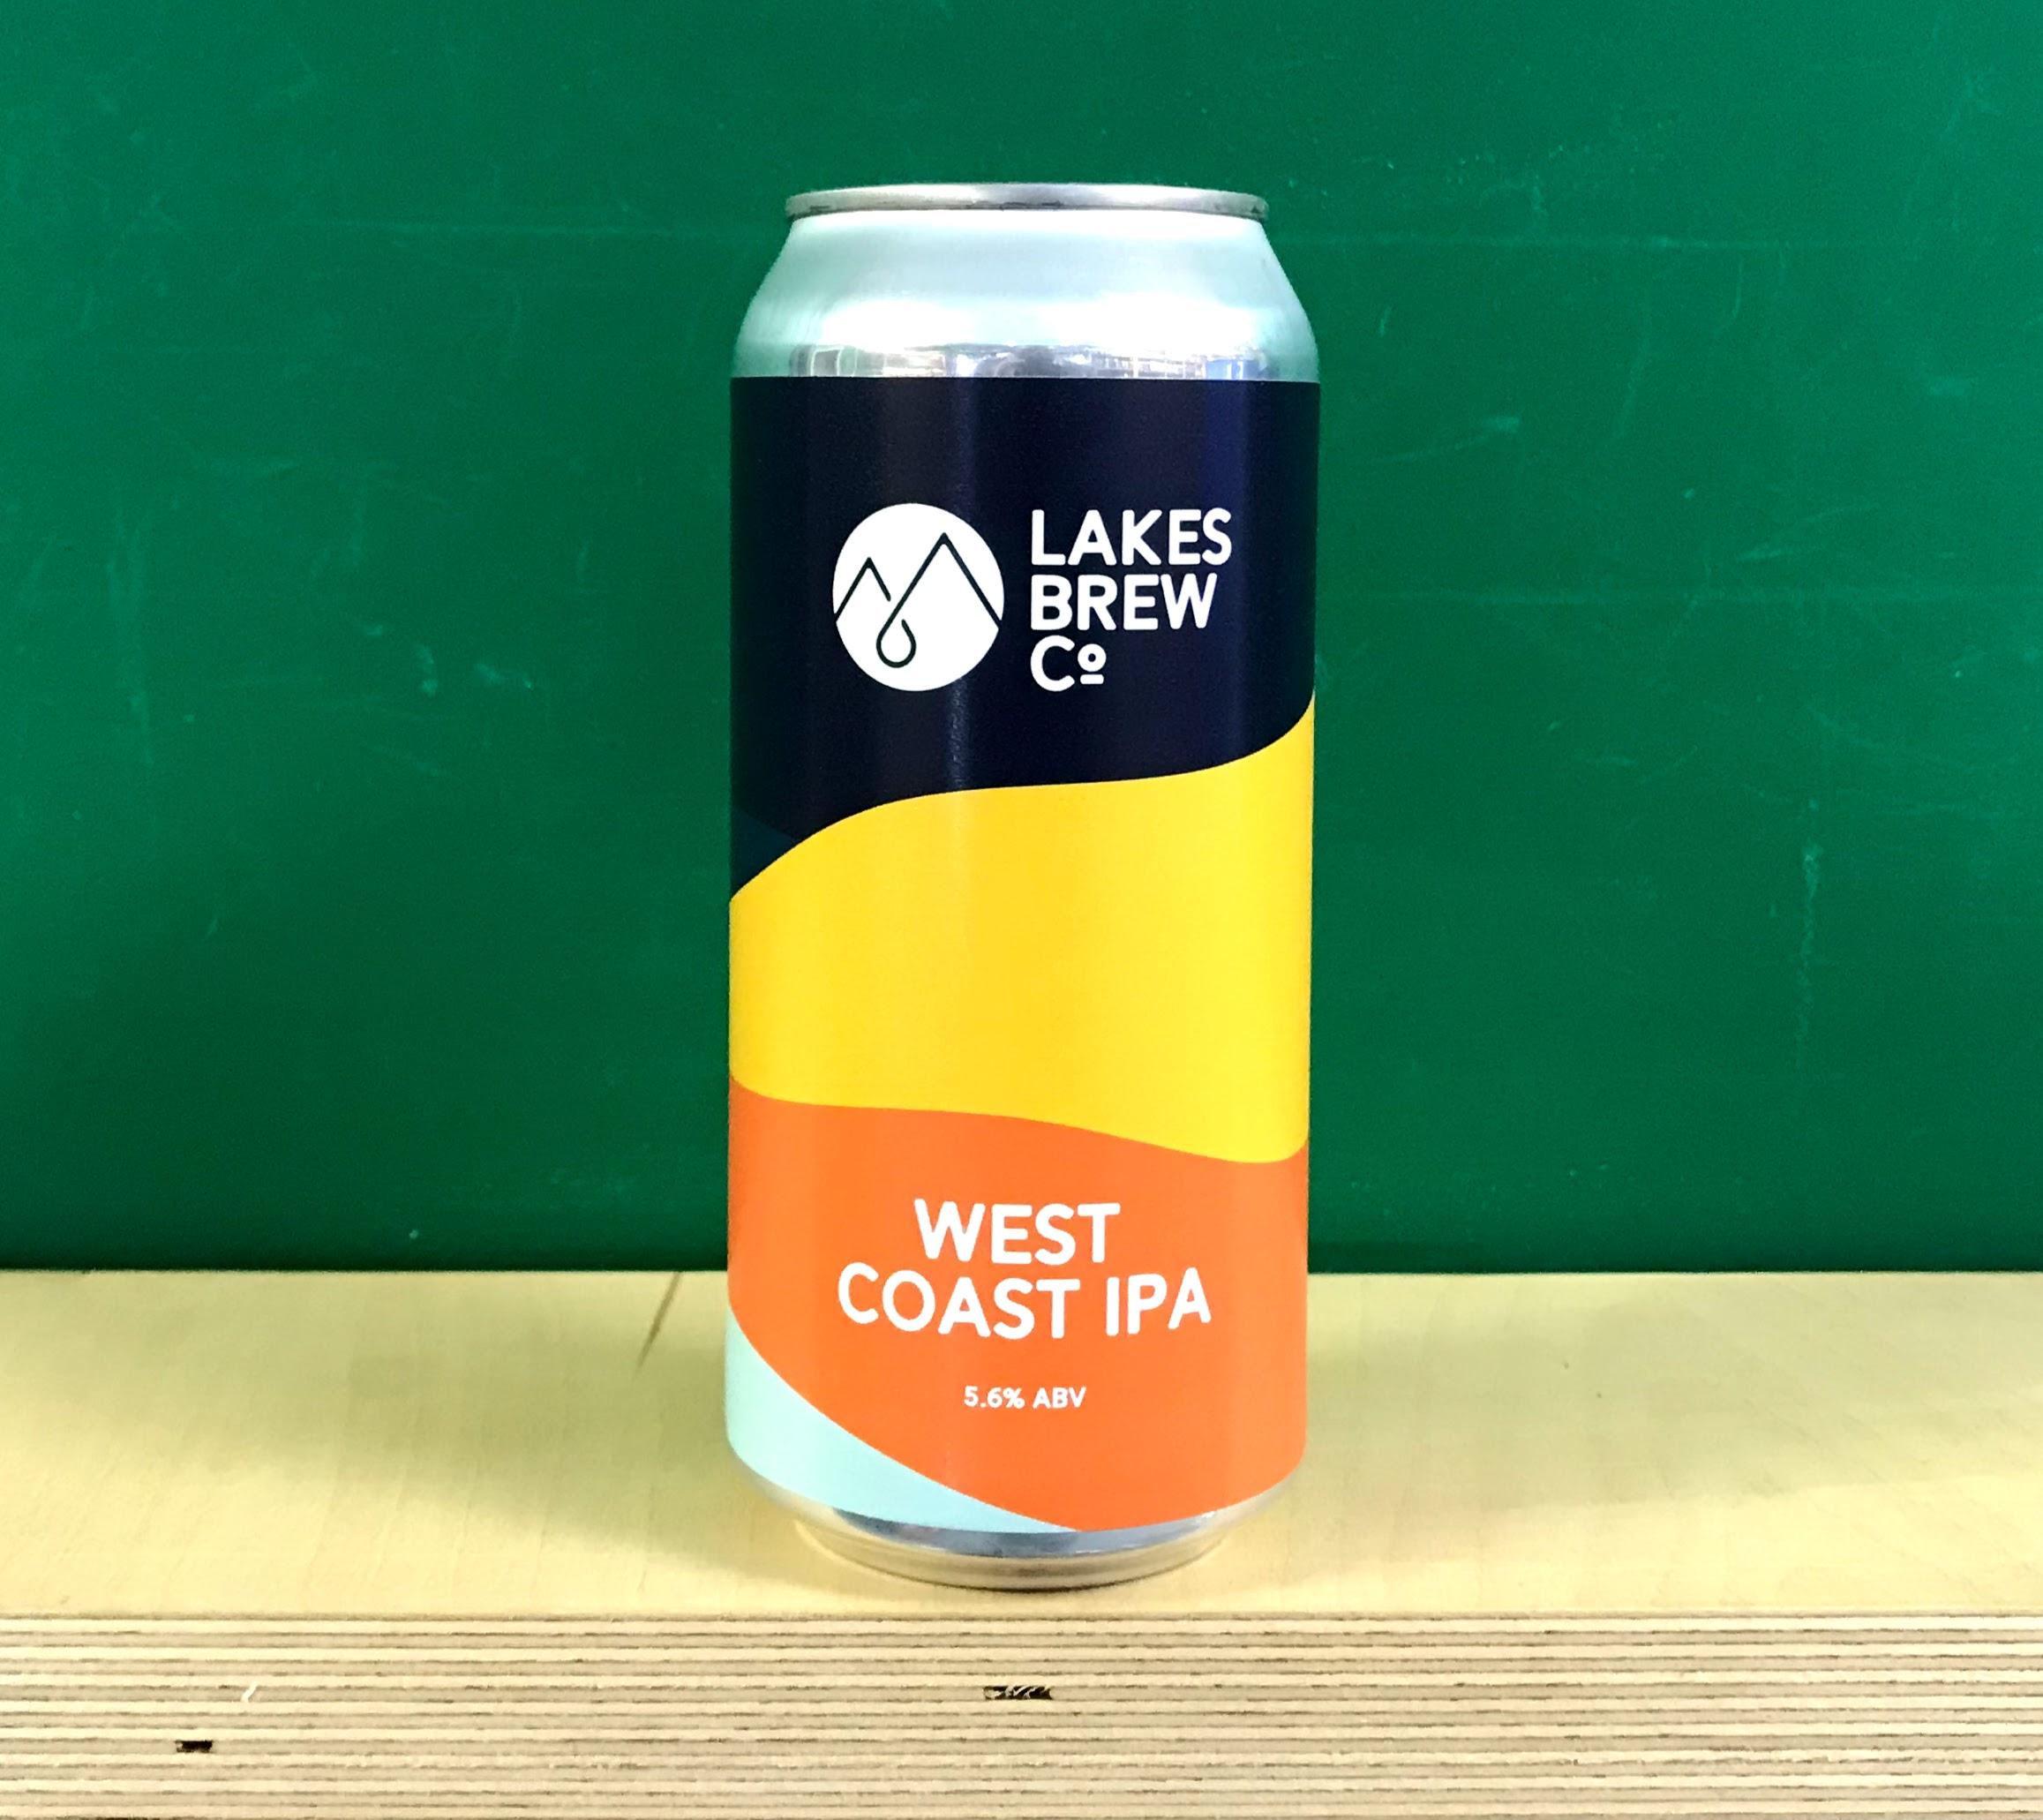 Lakes Brew Co West Coast IPA